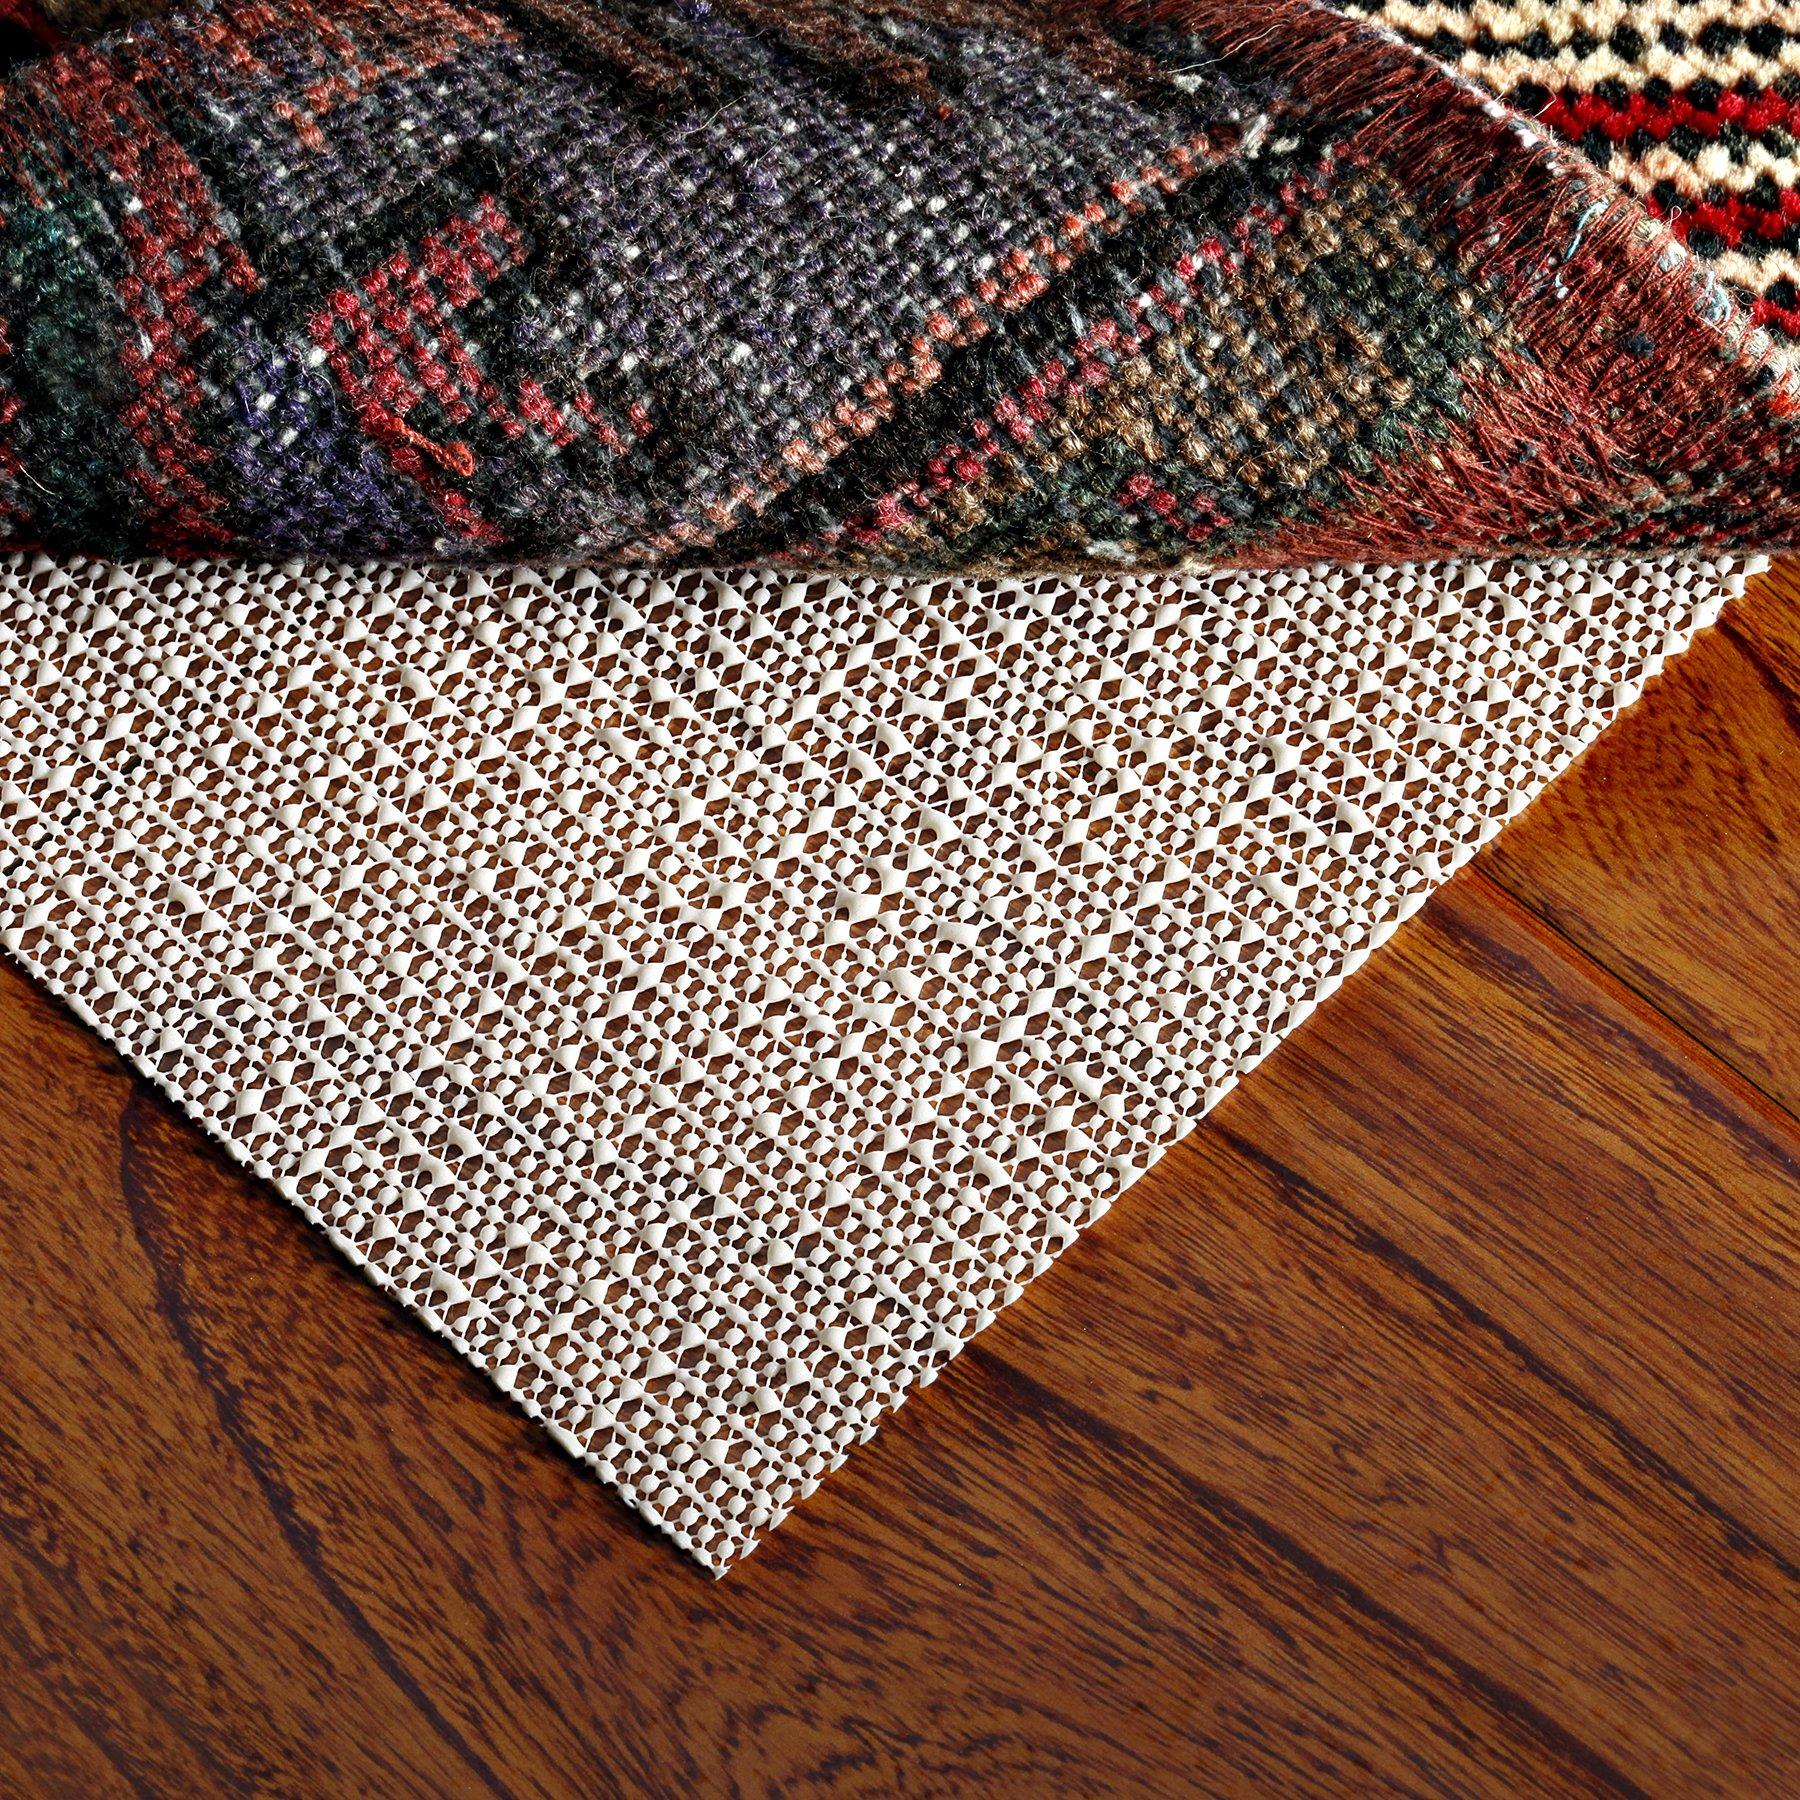 Under Rug Non Slip Pad, Rug Mat 4x6, Rug Gripper For Hard Floors,Securing Carpet On Hardwood Floor, Non Slip Pad For Mattress